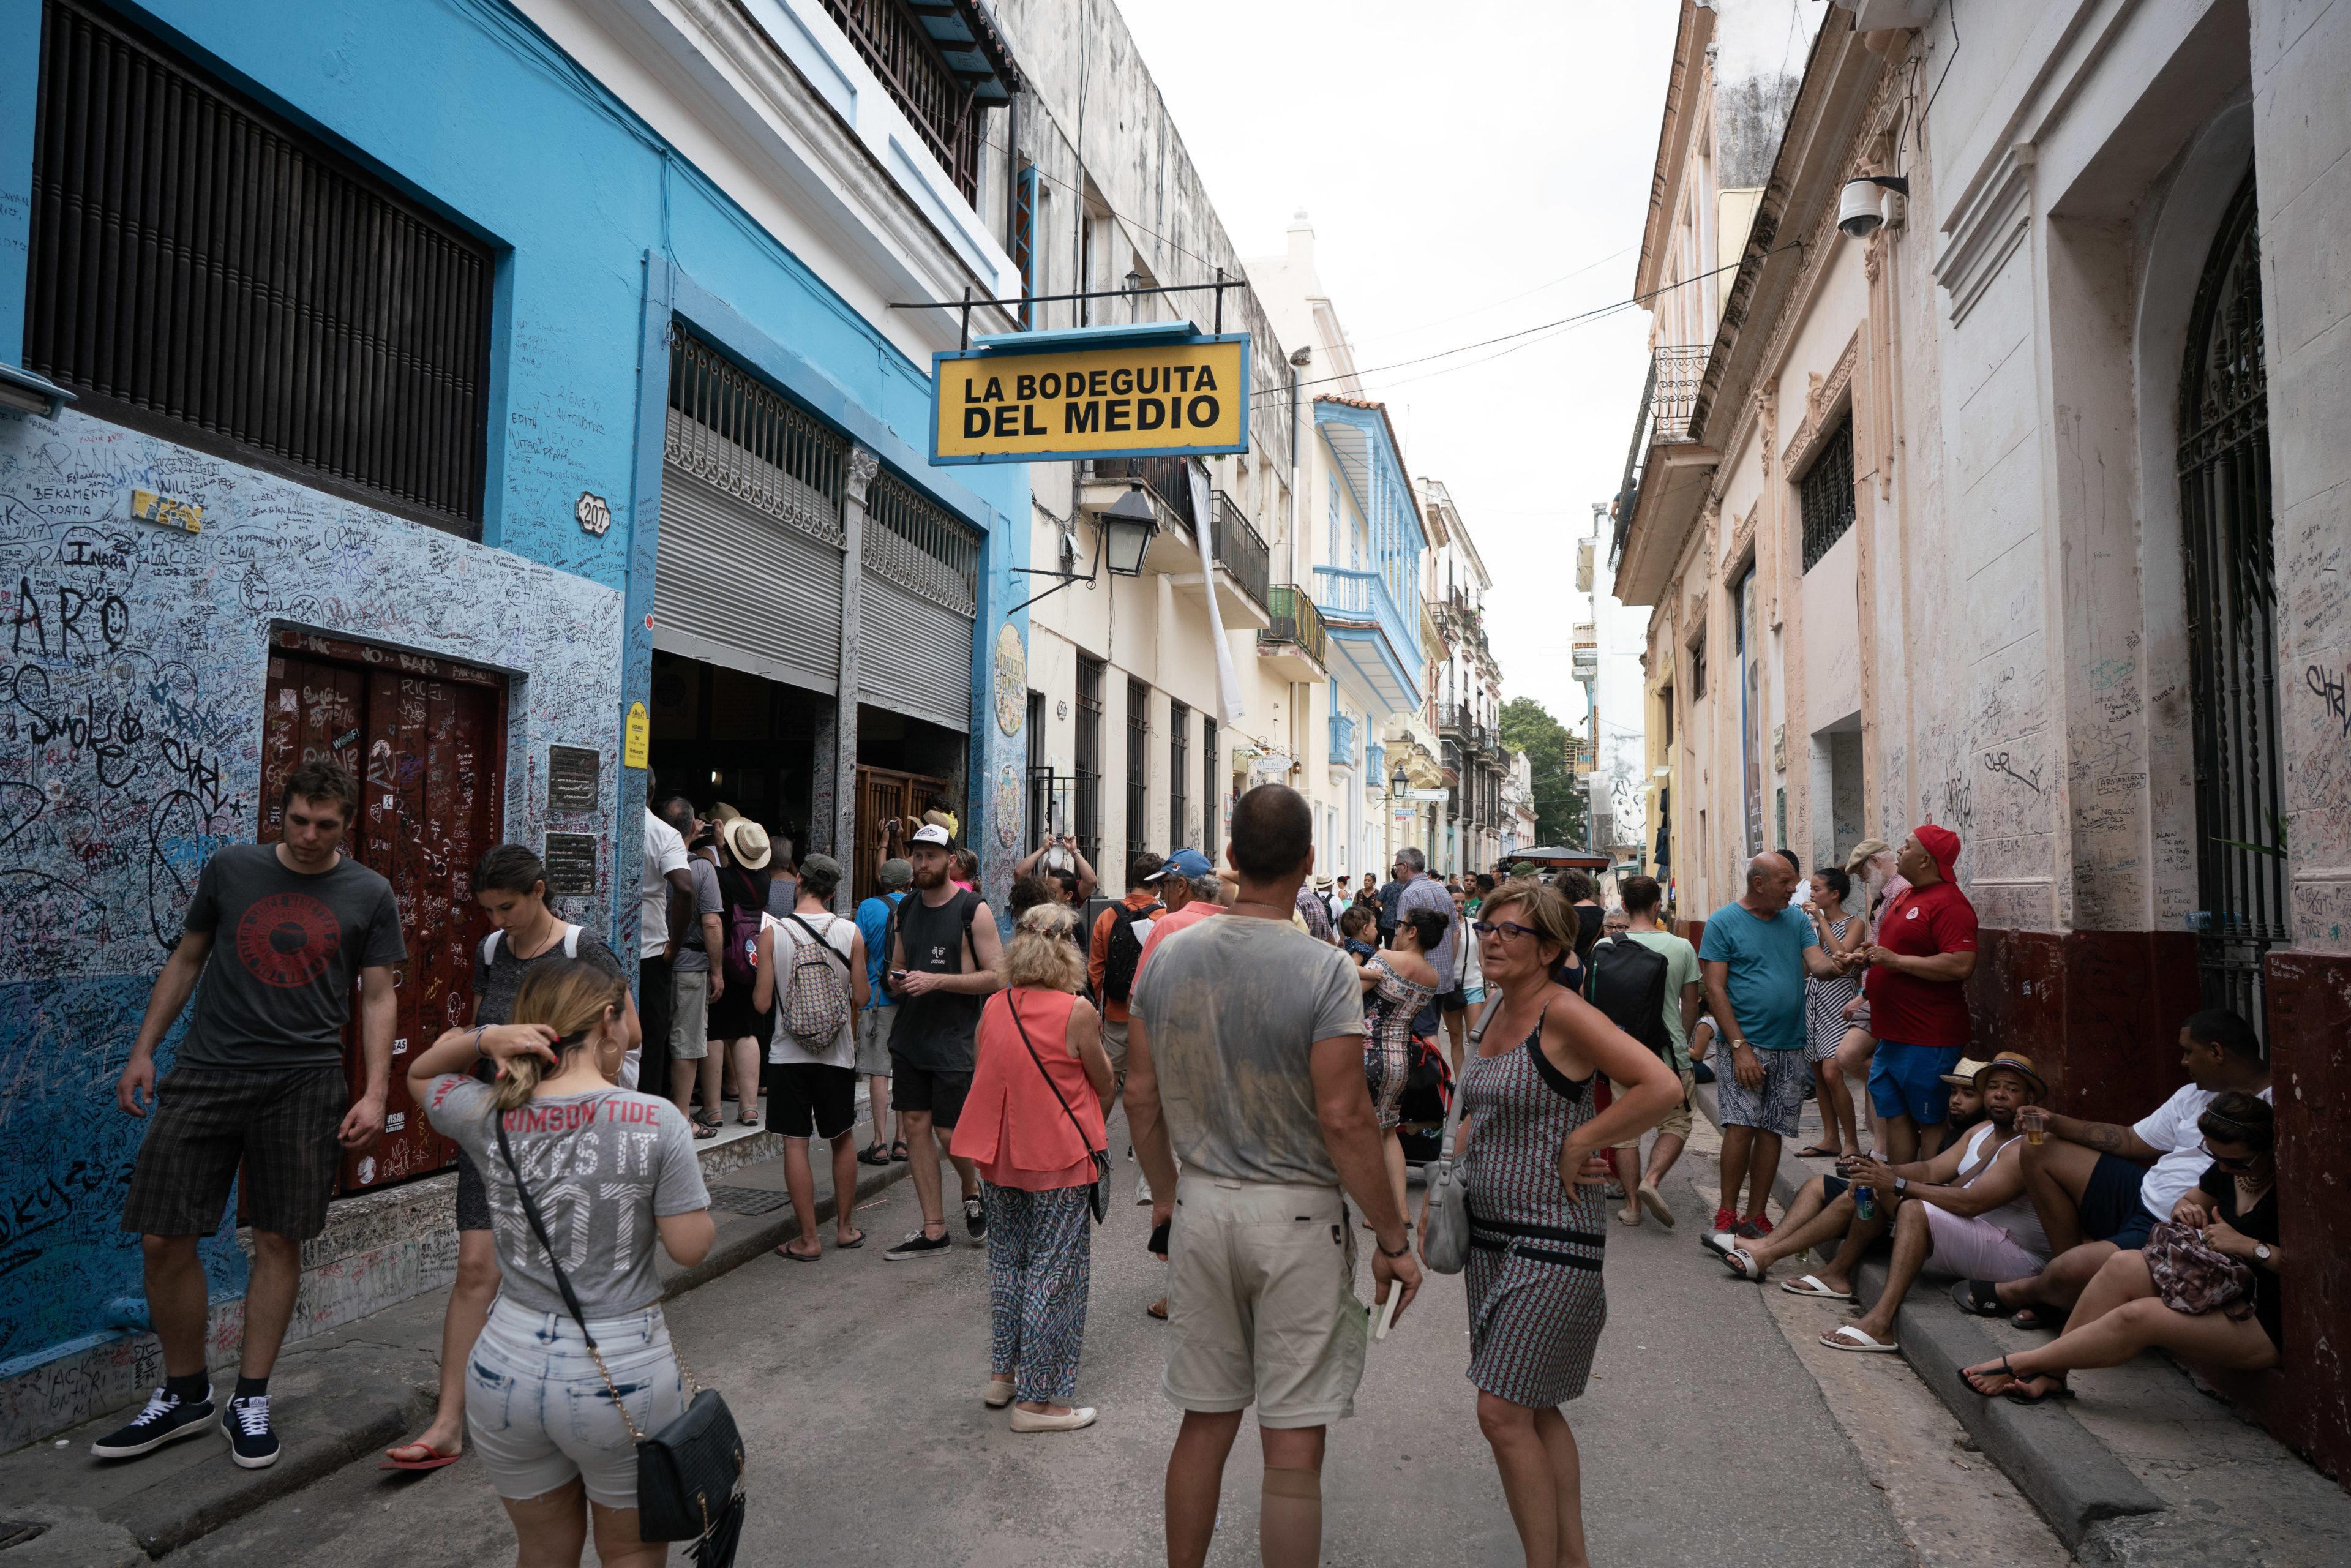 Leute vor Bar La Bodeguita in Havanna, Kuba